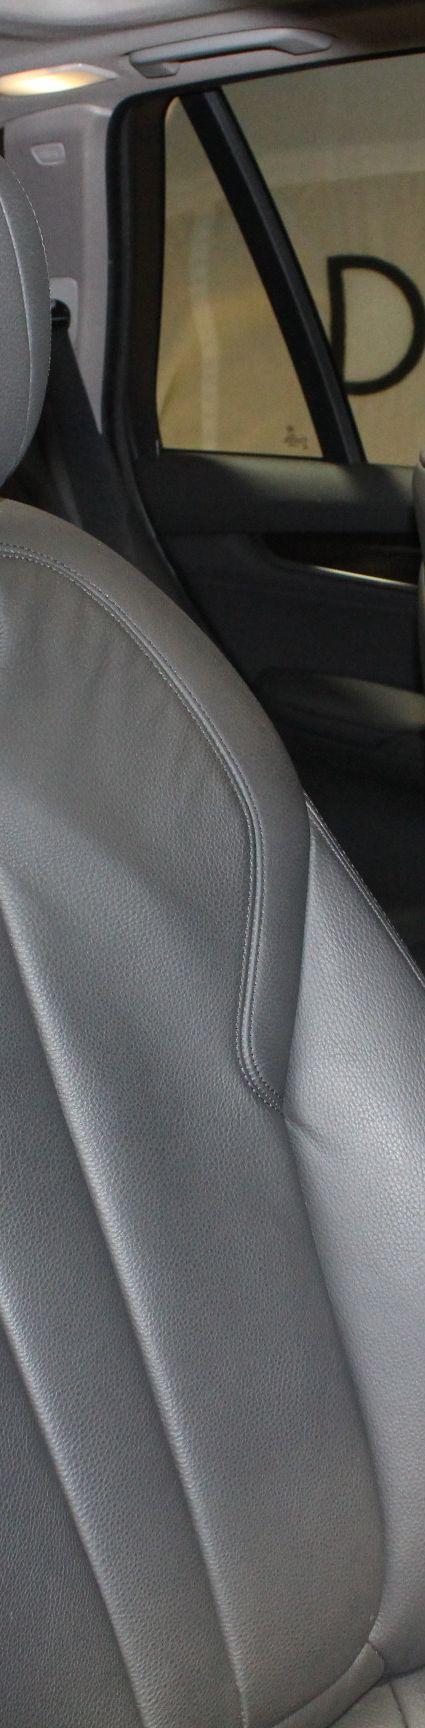 2014 BMW X5 F15 sDrive25d Wagon 5dr Auto 8sp 2.0DTT (Apr) - for sale in Australia